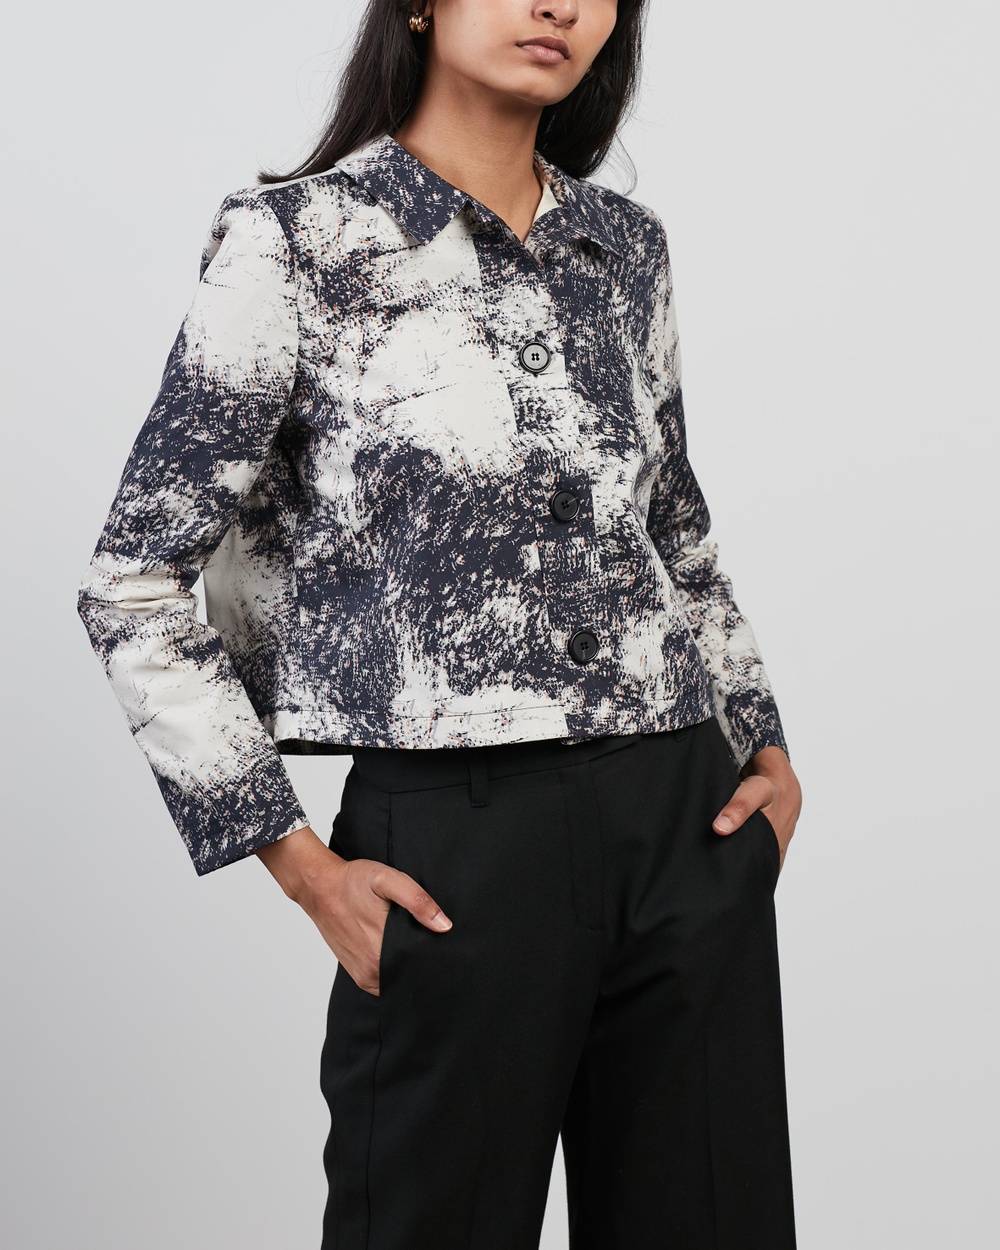 Aligne Chyna M Cropped Boxy Jacket Coats & Jackets Marble Print